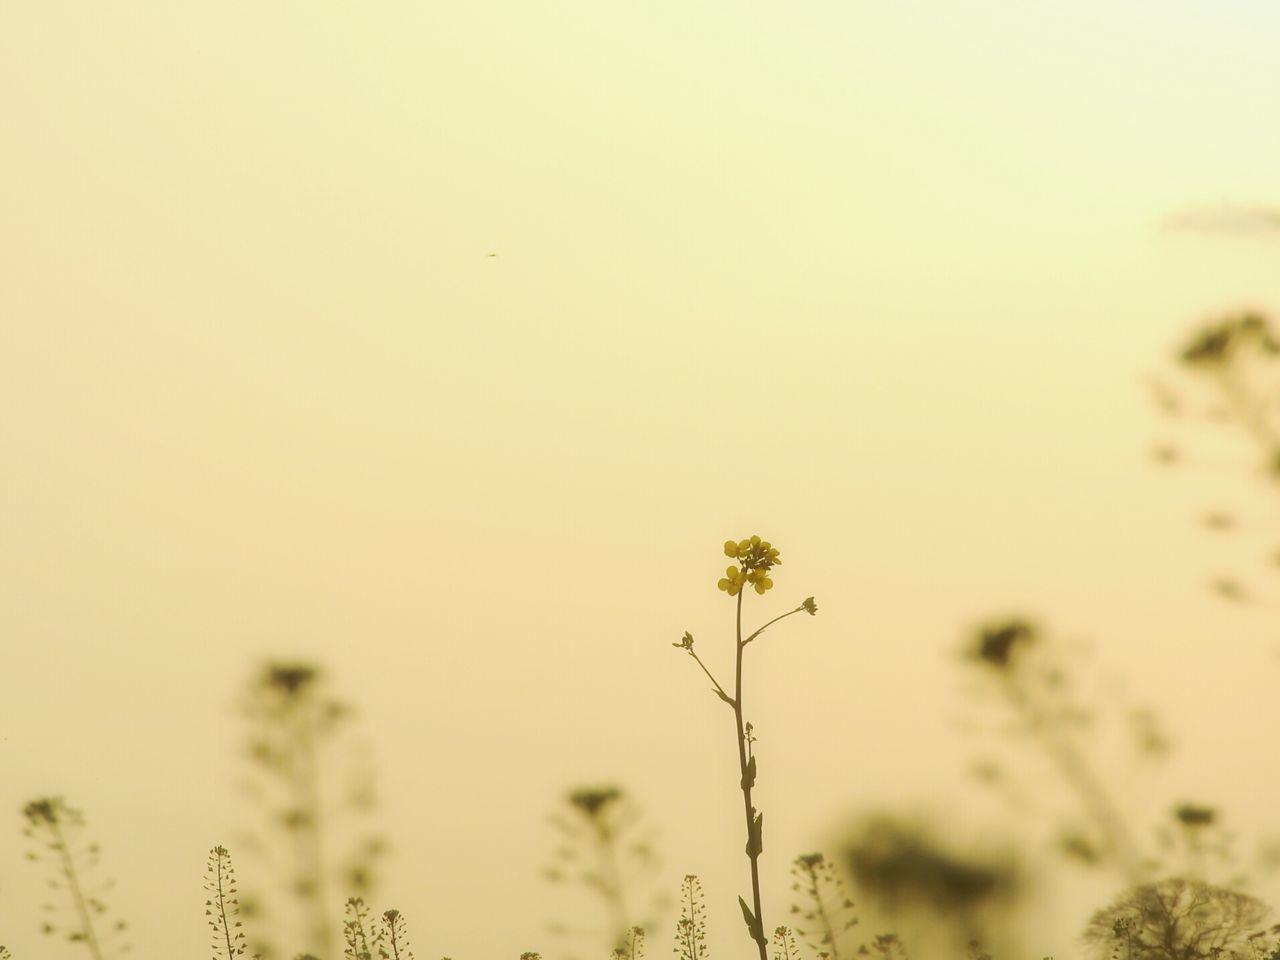 How Do We Build The World? Flowers 菜の花 EyeEm Gallery Nature Photography Eye4photography  Pastel Power The Week On Eyem Open Edit Naturelovers Sunset おはようございます。(๑•̀ㅂ•́)و✧